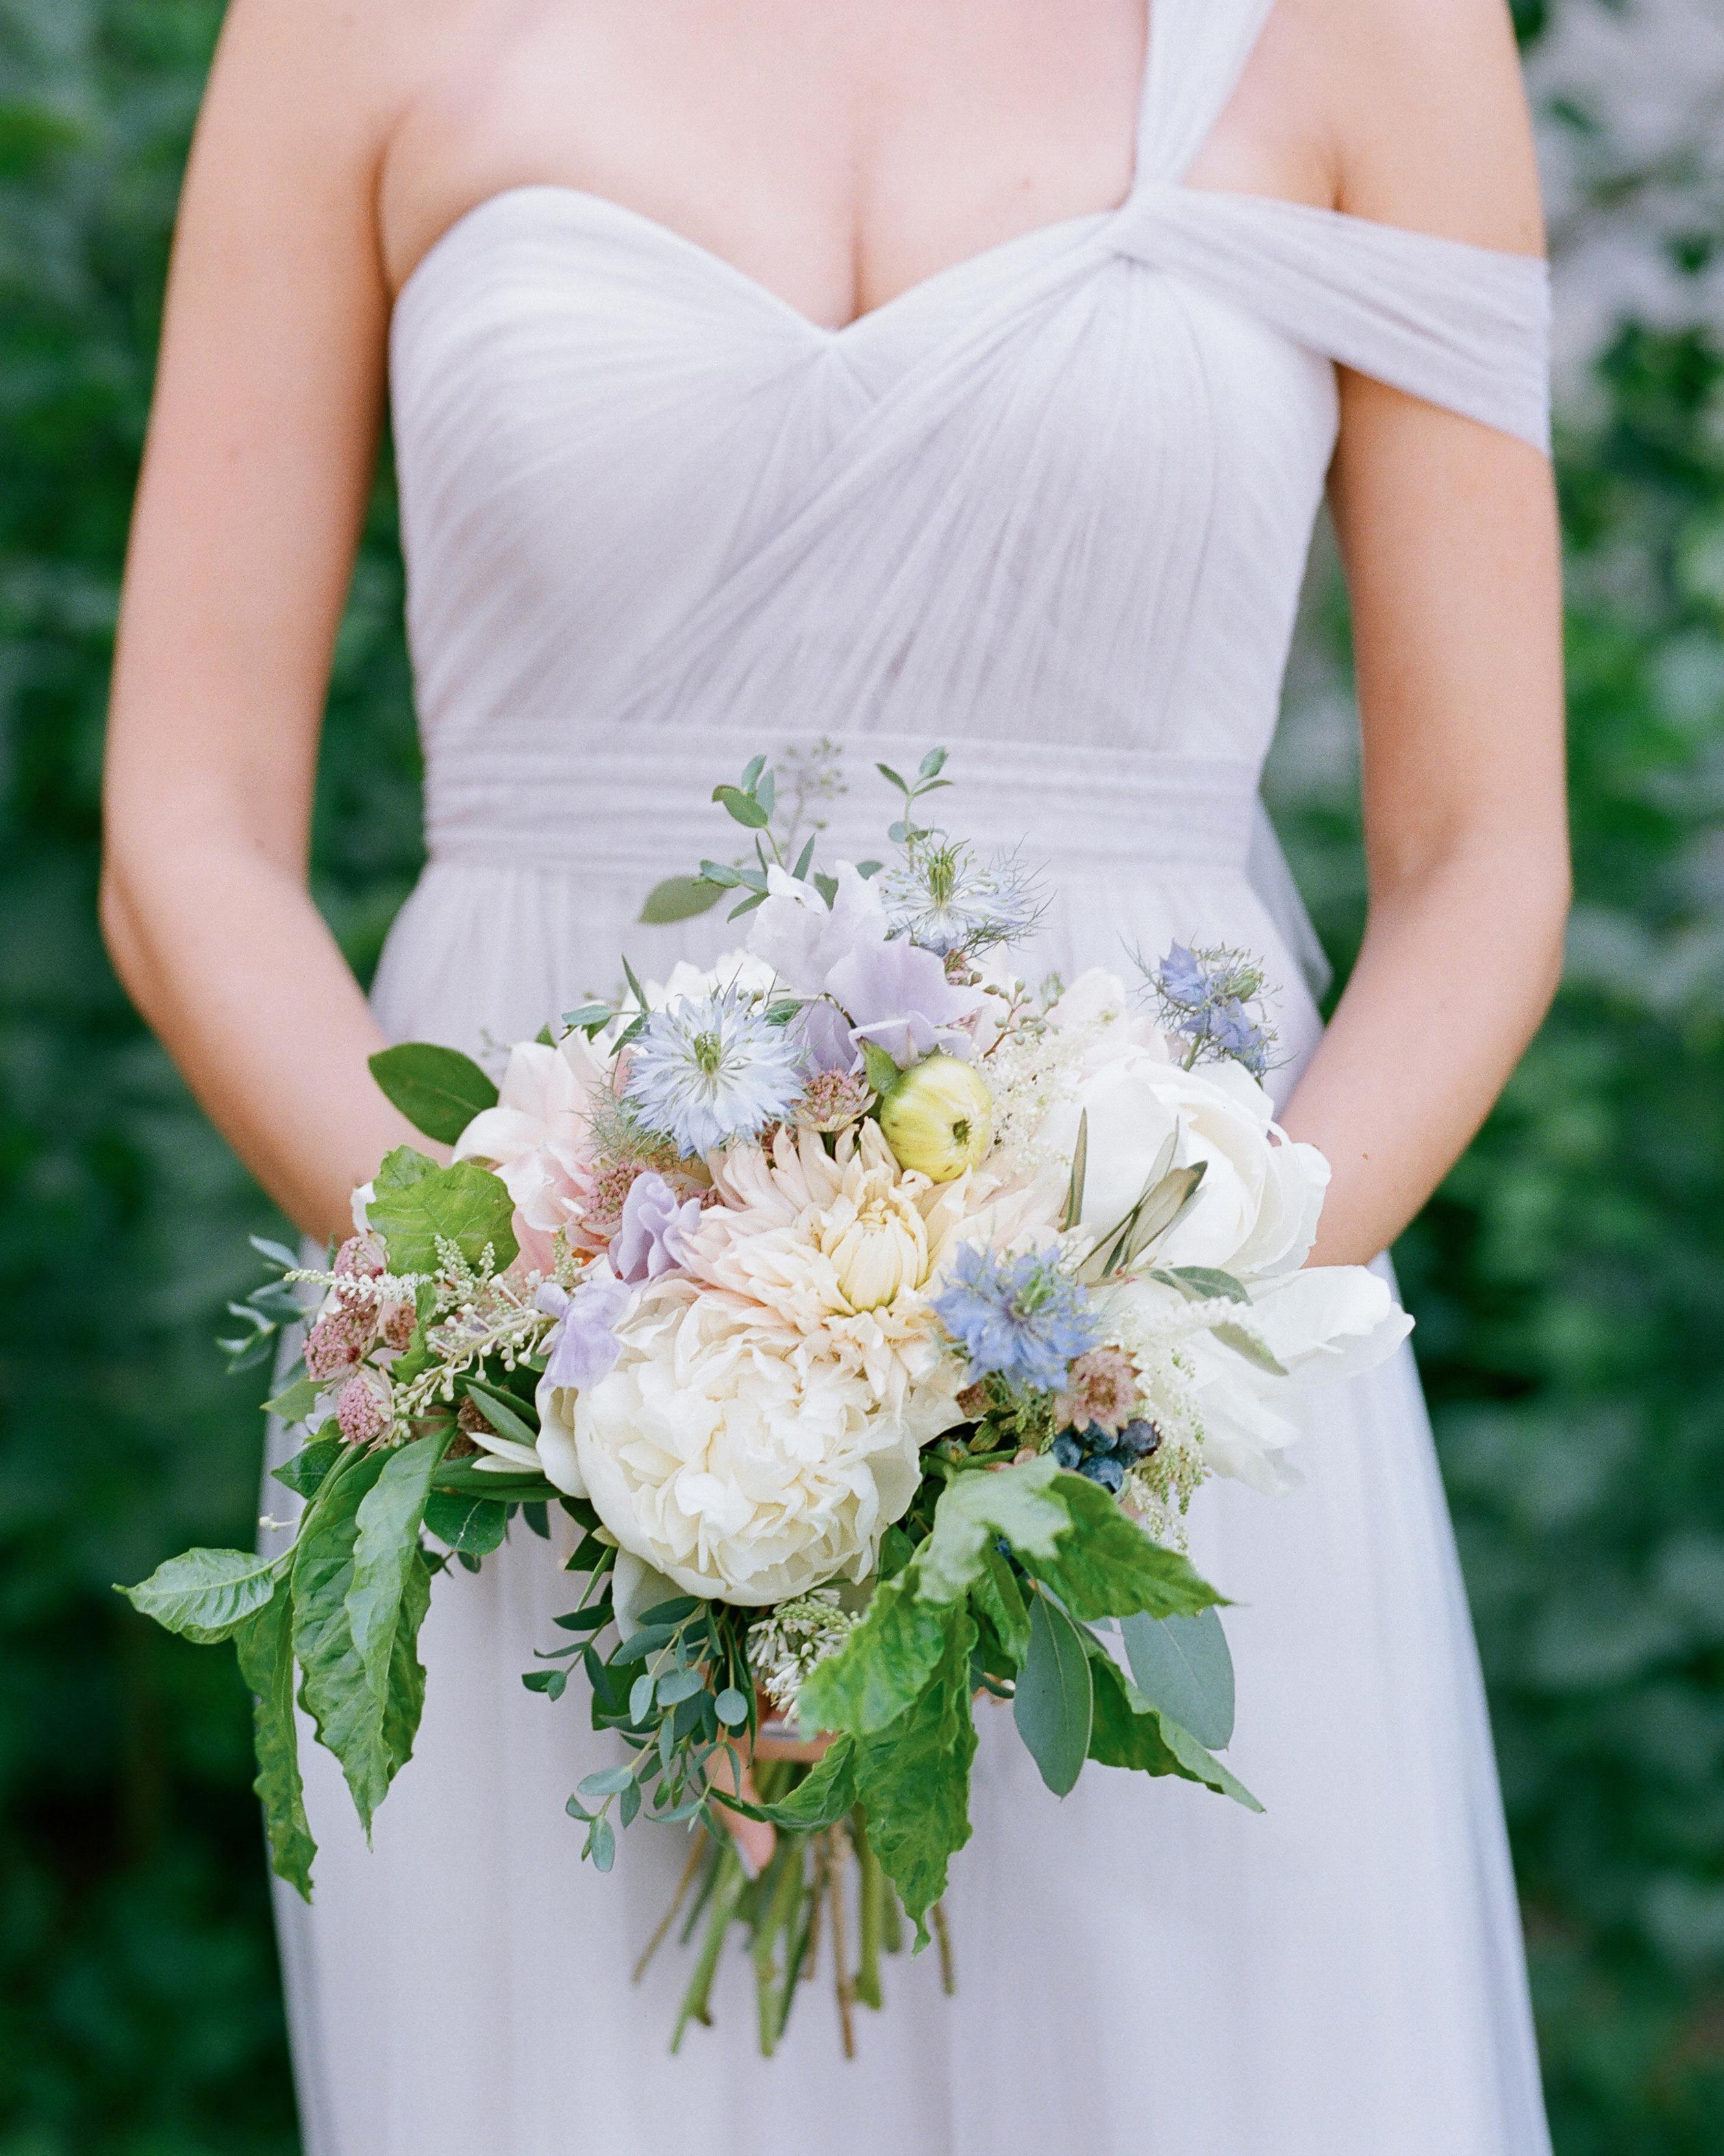 tara-nick-wedding-connecticut-123-s112082-0915.jpg